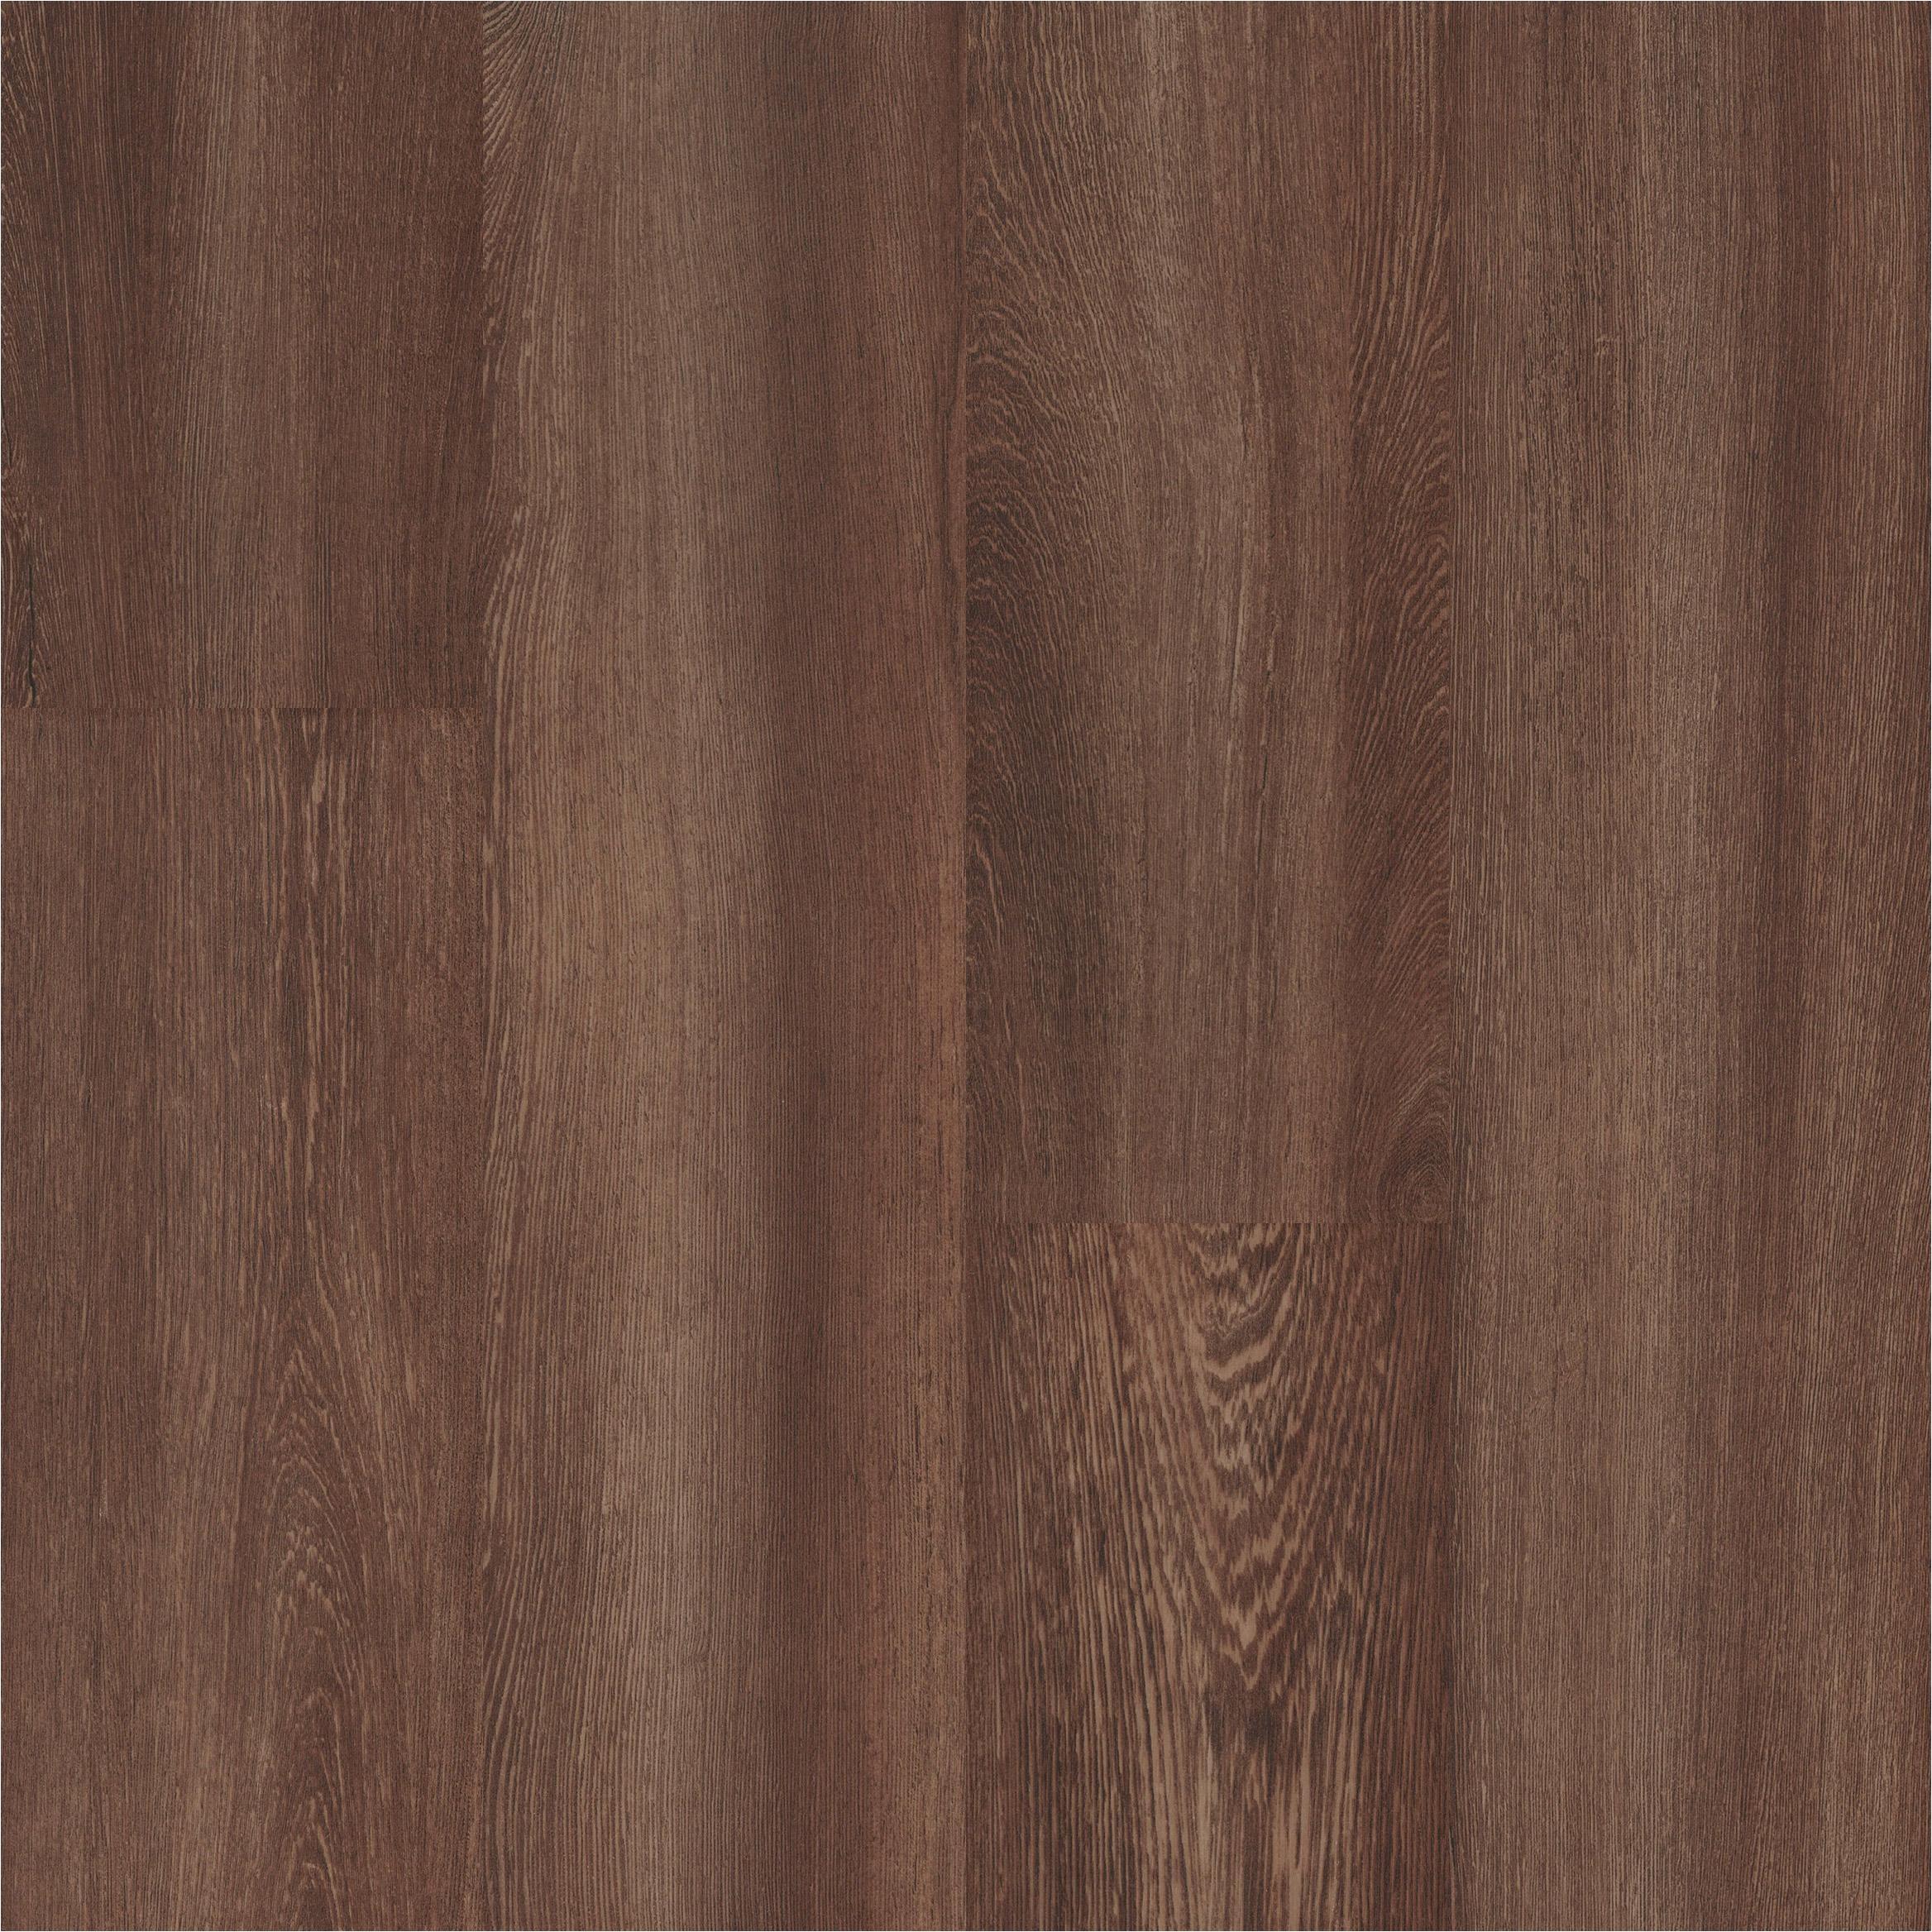 Is Vinyl Wood Flooring Waterproof Ivc Moduleo Horizon normandy Oak 6 Waterproof Luxury Vinyl Plank